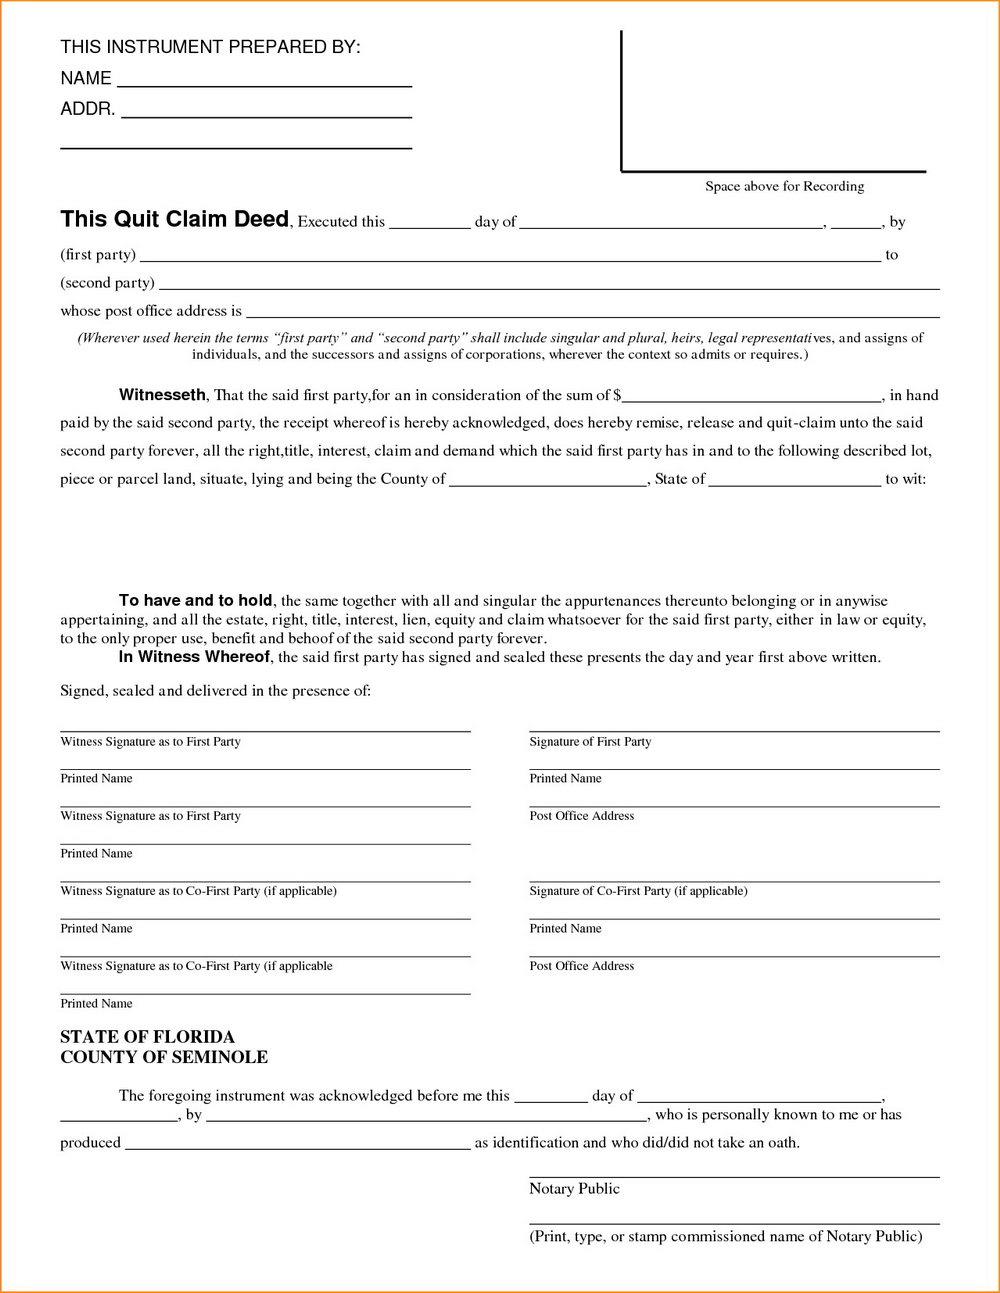 Colorado Quit Claim Deed Form